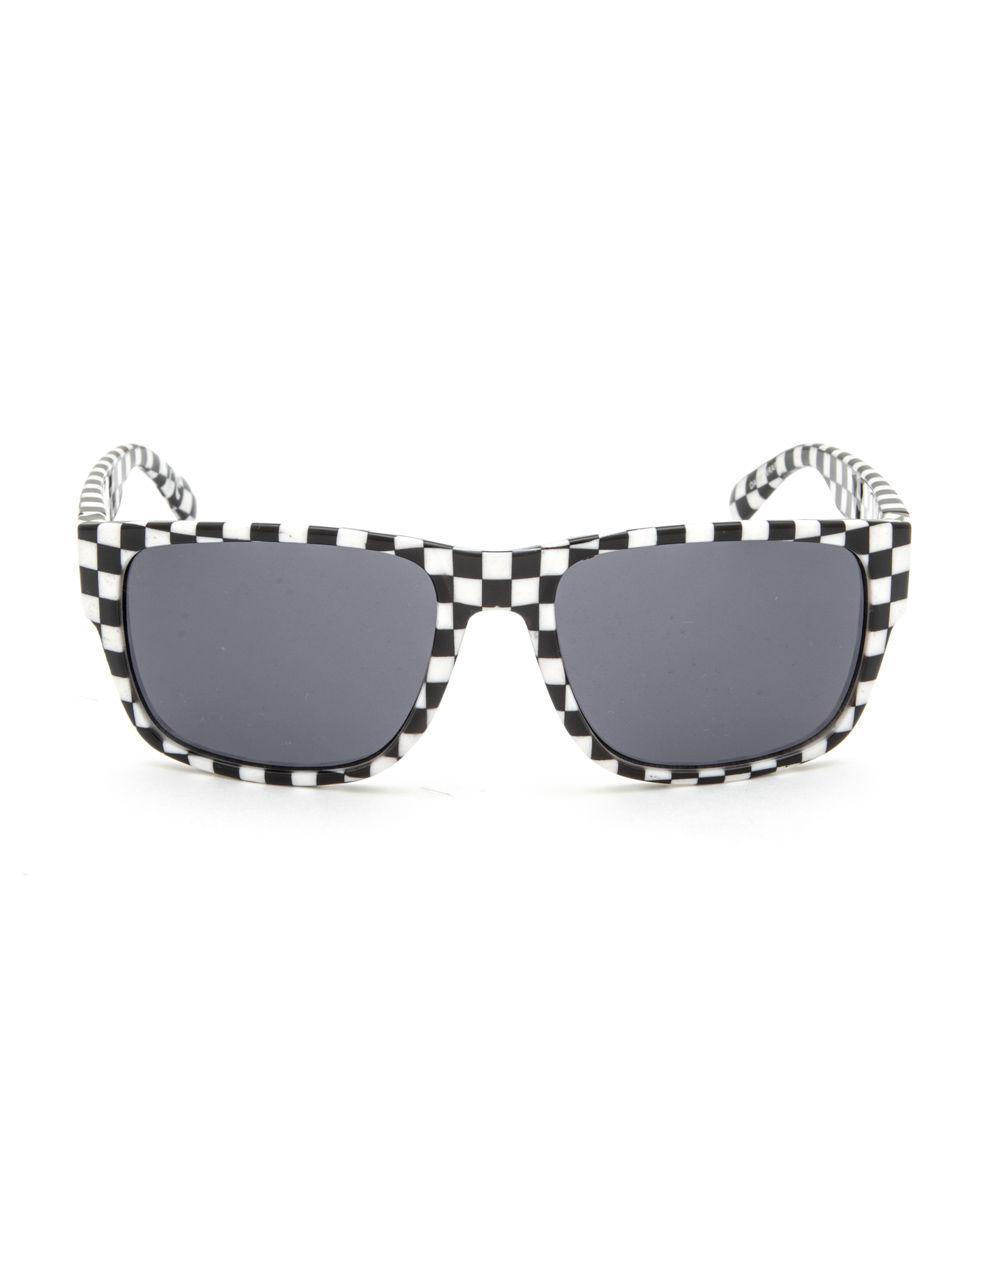 3c118b40c2a Vans Men For Checkered Lyst Darr Wrap Sunglasses dAdqRw